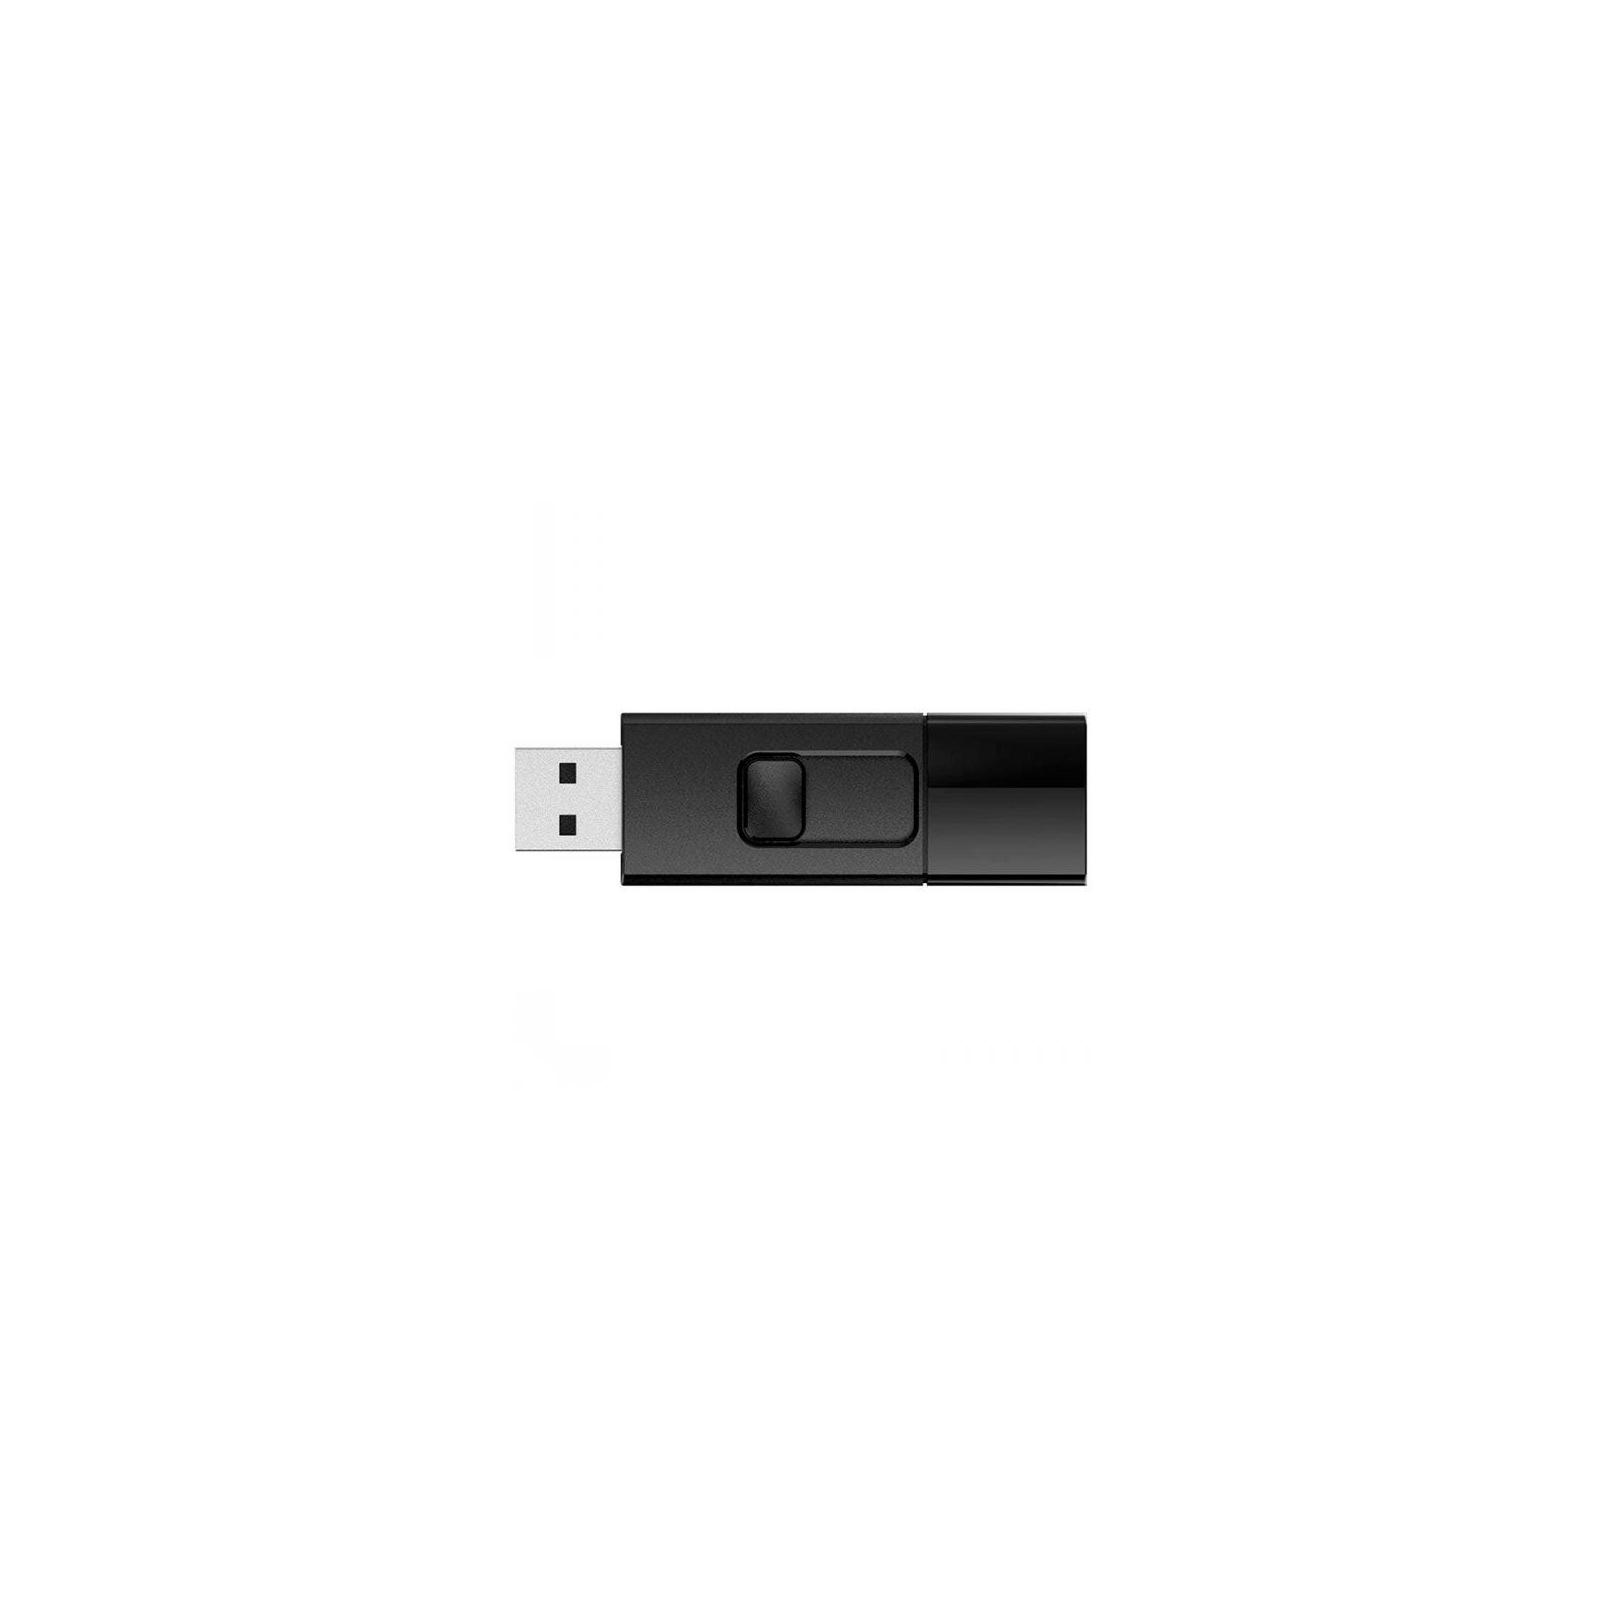 USB флеш накопитель Silicon Power 32GB Secure G50 USB 3.0 (SP032GBUF3G50V1K) изображение 3